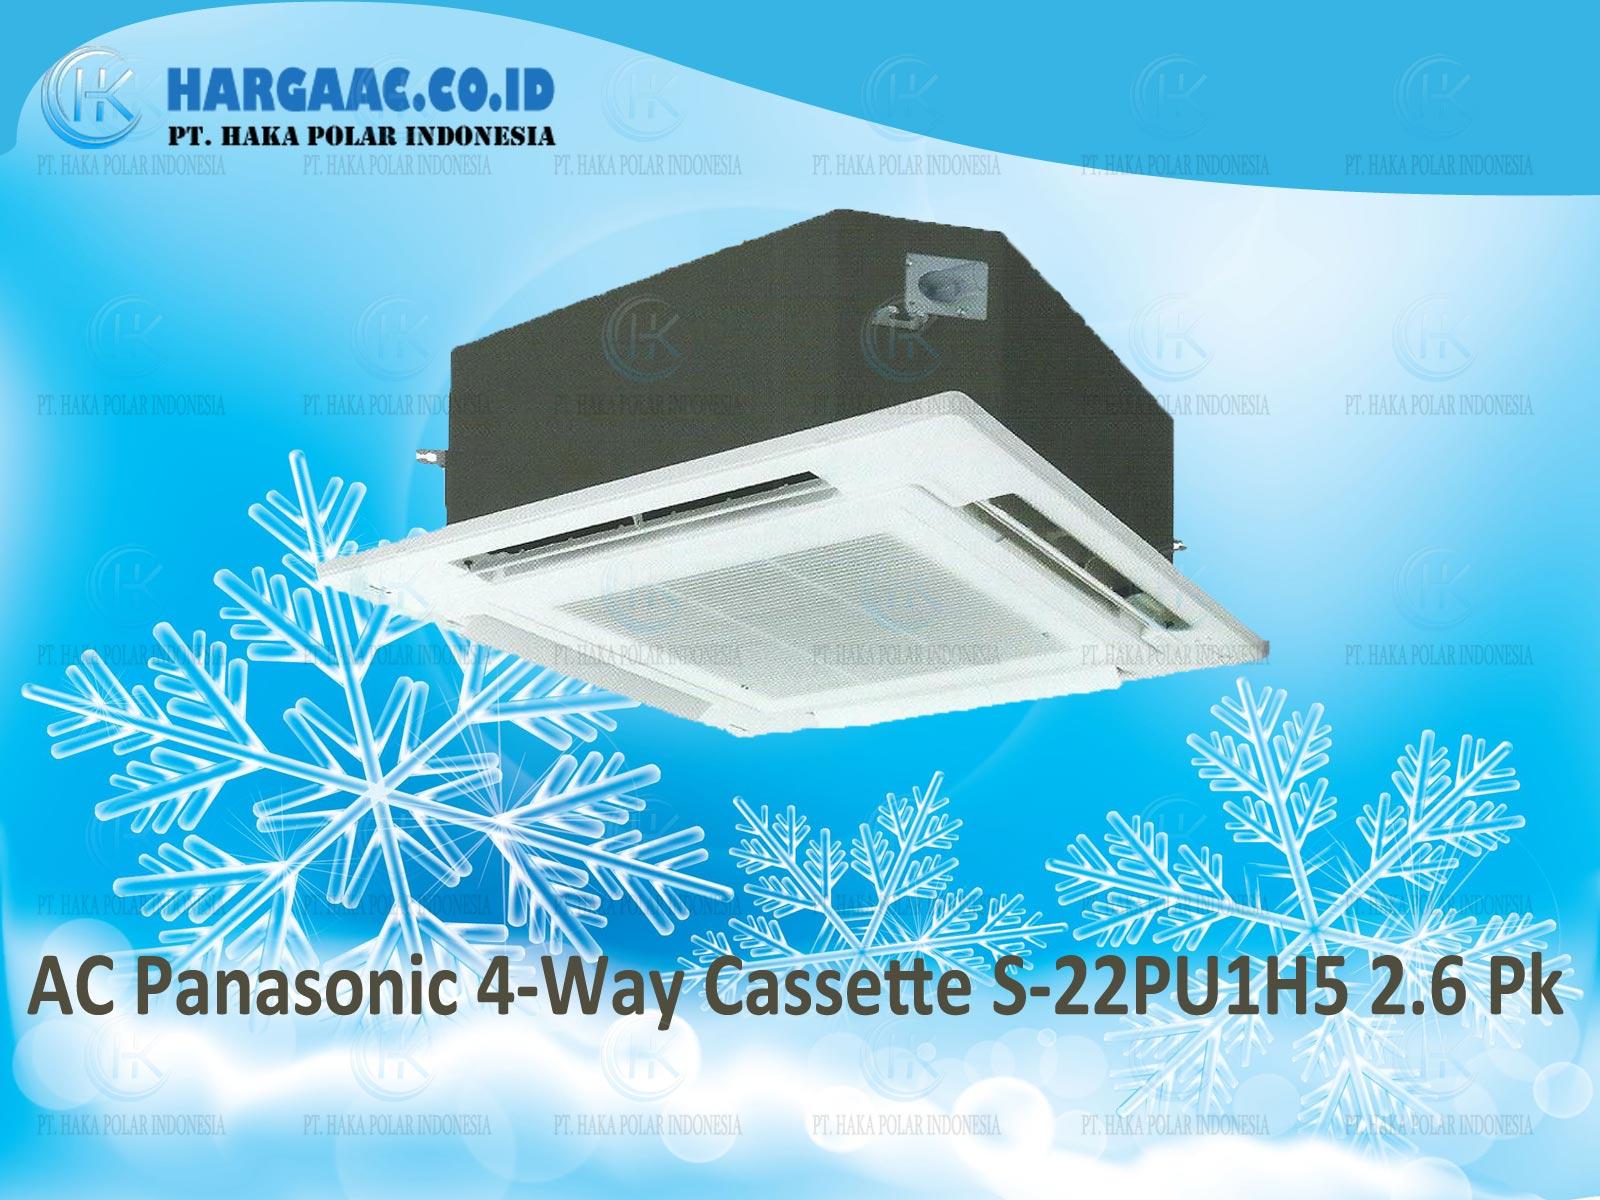 AC Panasonic 4-Way Cassette S-22PU1H5 1 Phase 2.6 PK R410a